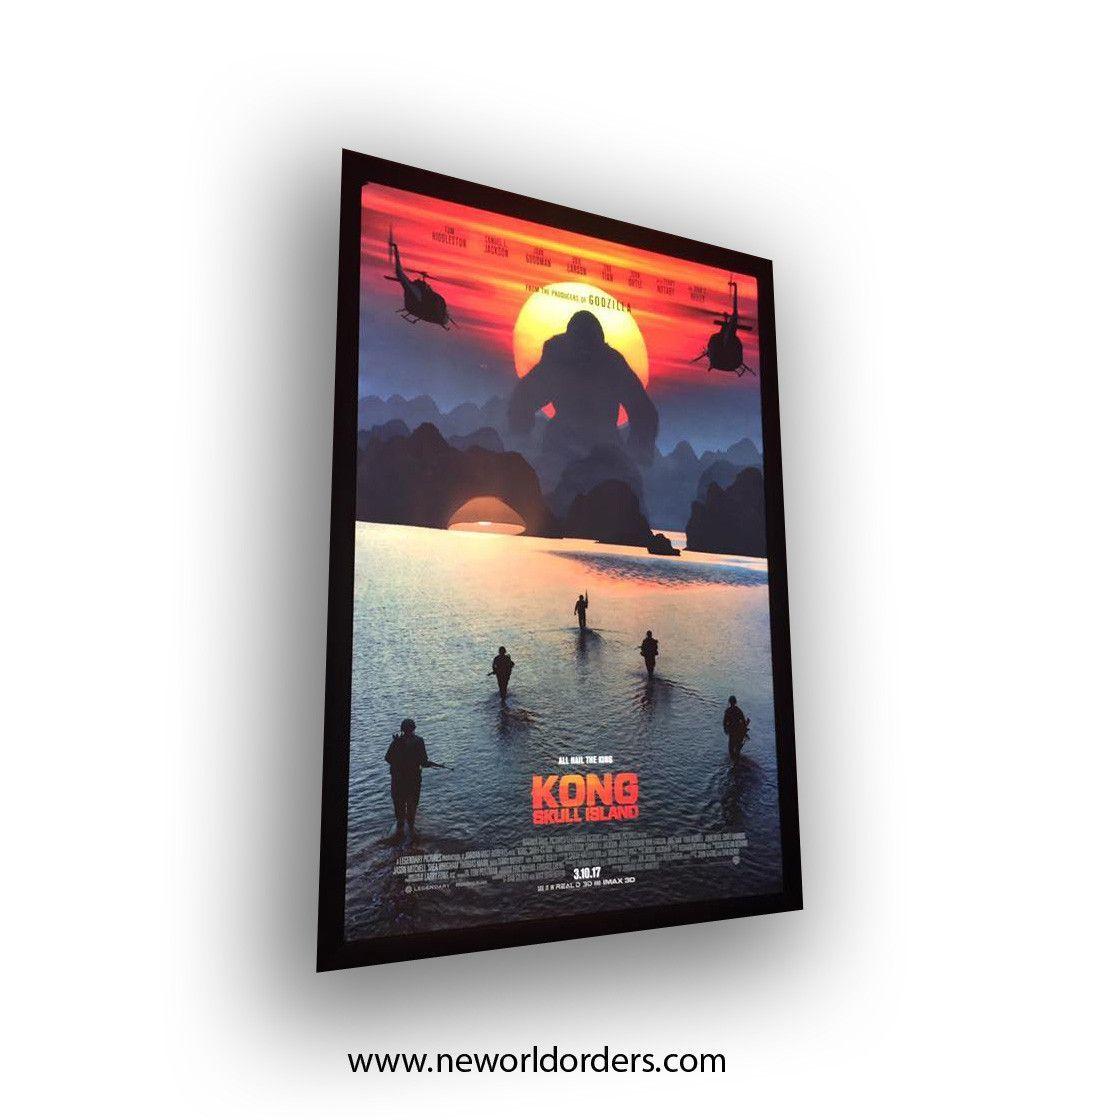 1 27x40 premium led light box movie poster display frame led 1 27x40 premium led light box movie poster display frame jeuxipadfo Gallery